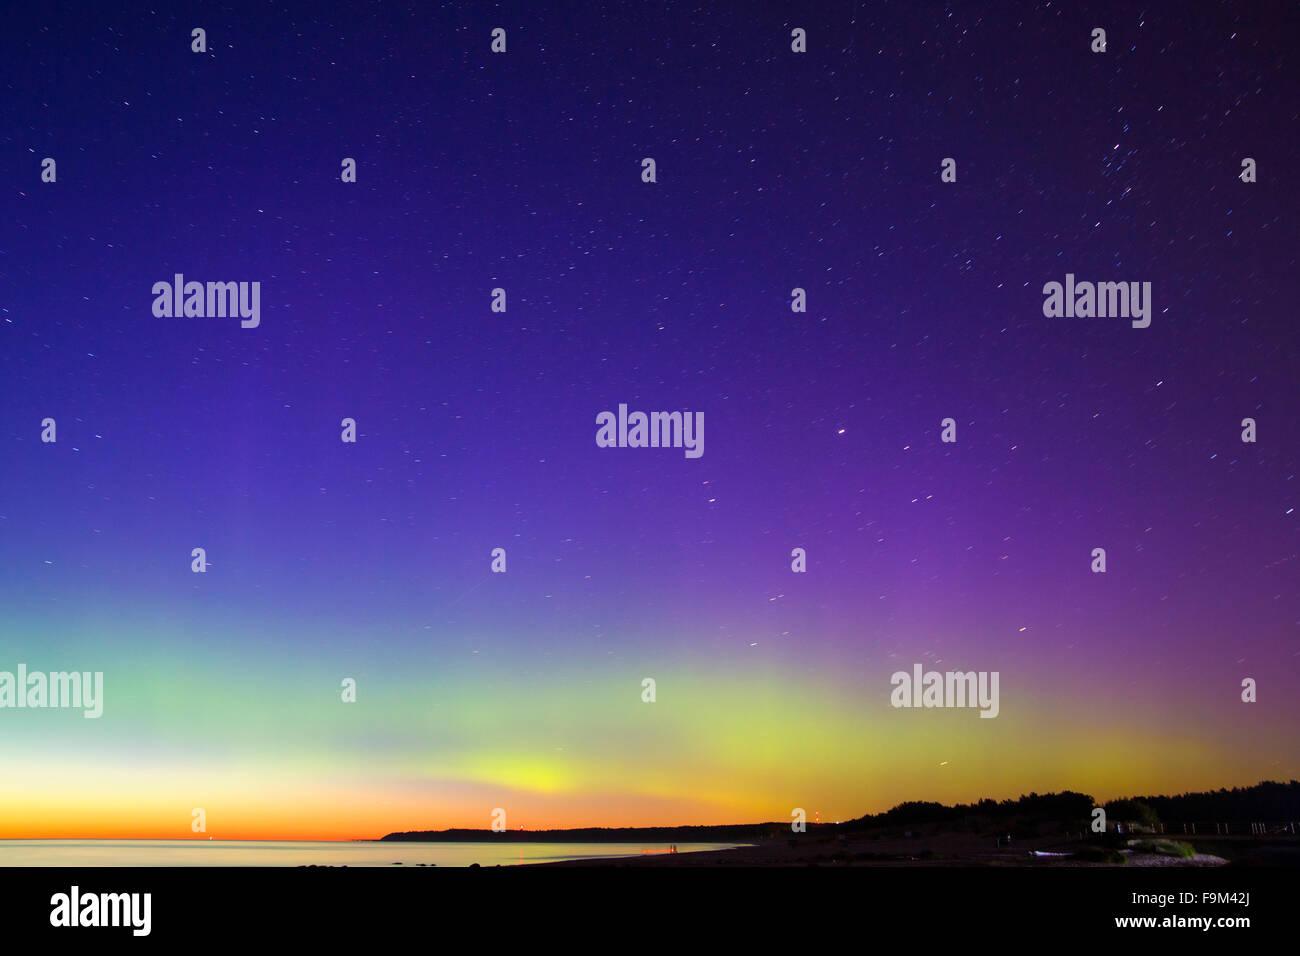 Warm Aurora Borealis above the Northern Sea - Stock Image